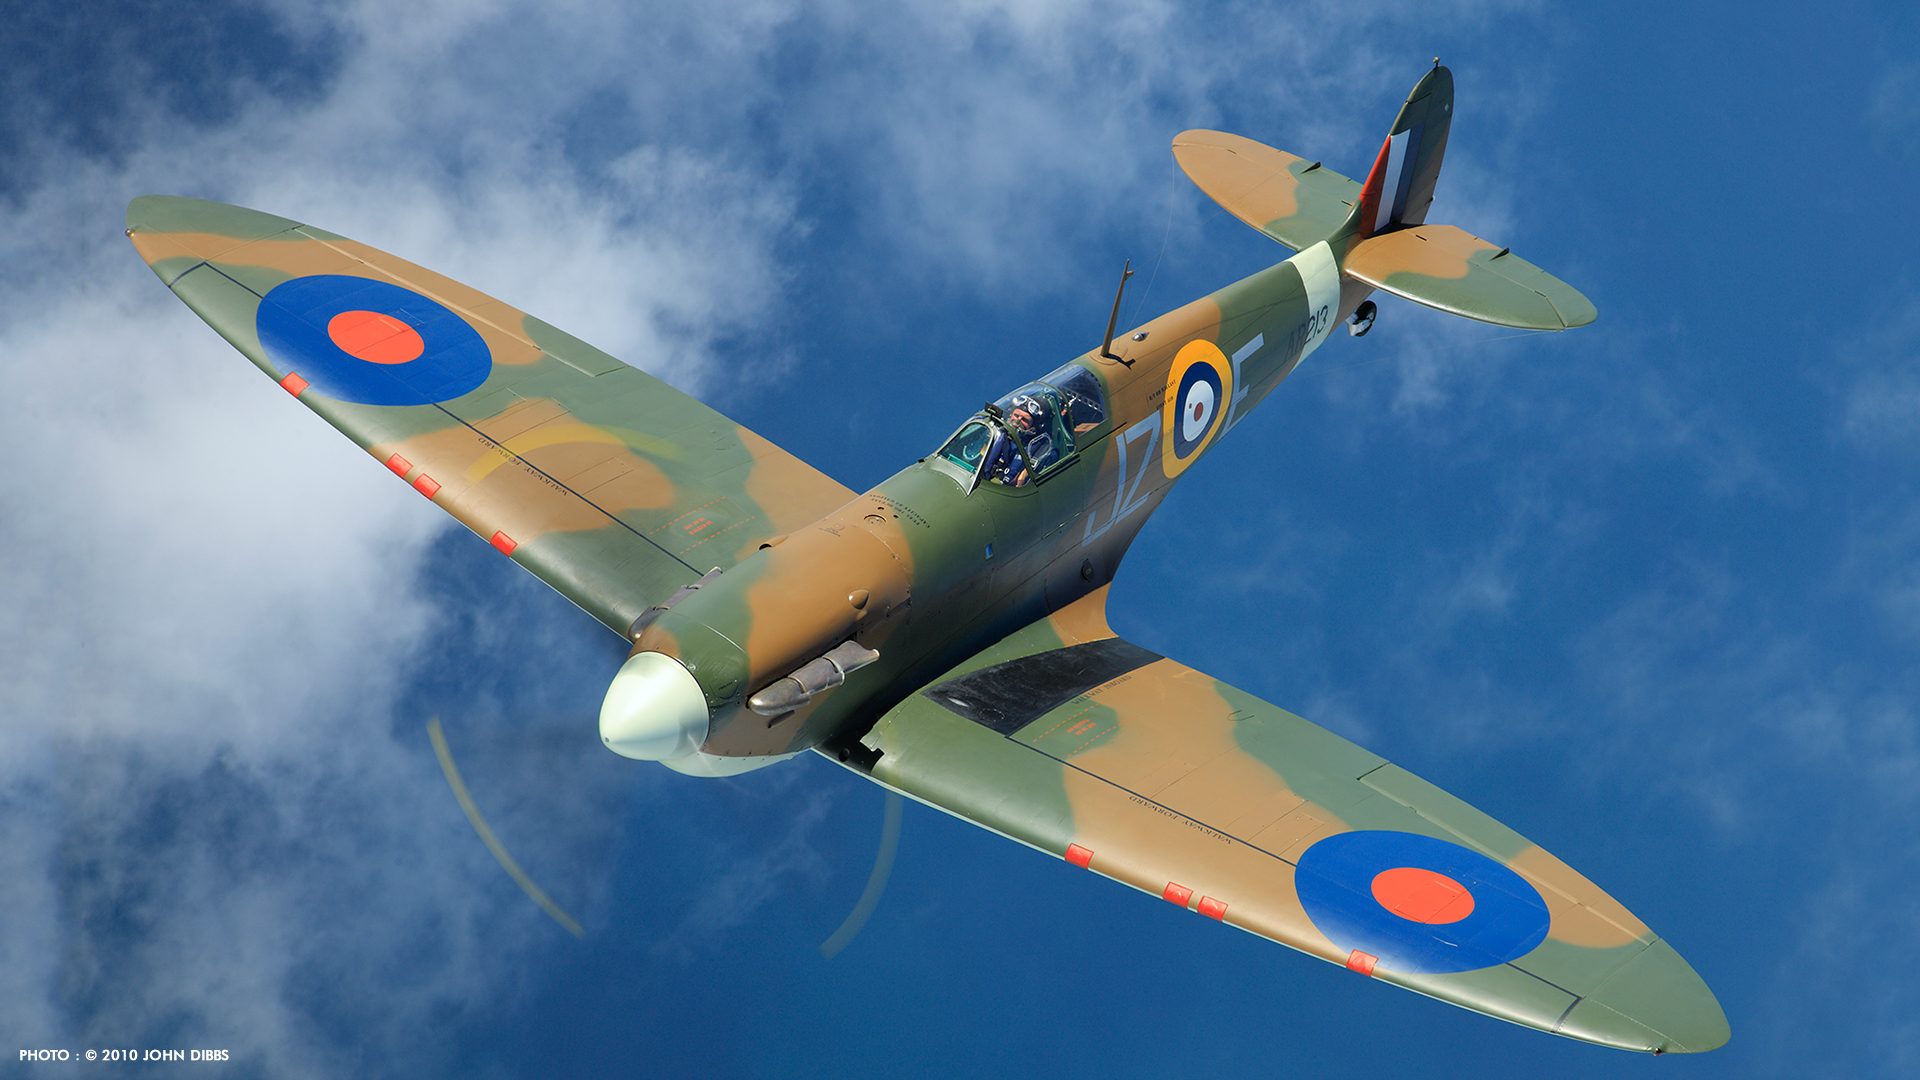 Hd Wallpapers Spitfire Plane 1680 X 1050 871 Kb Jpeg HD Wallpapers 1920x1080